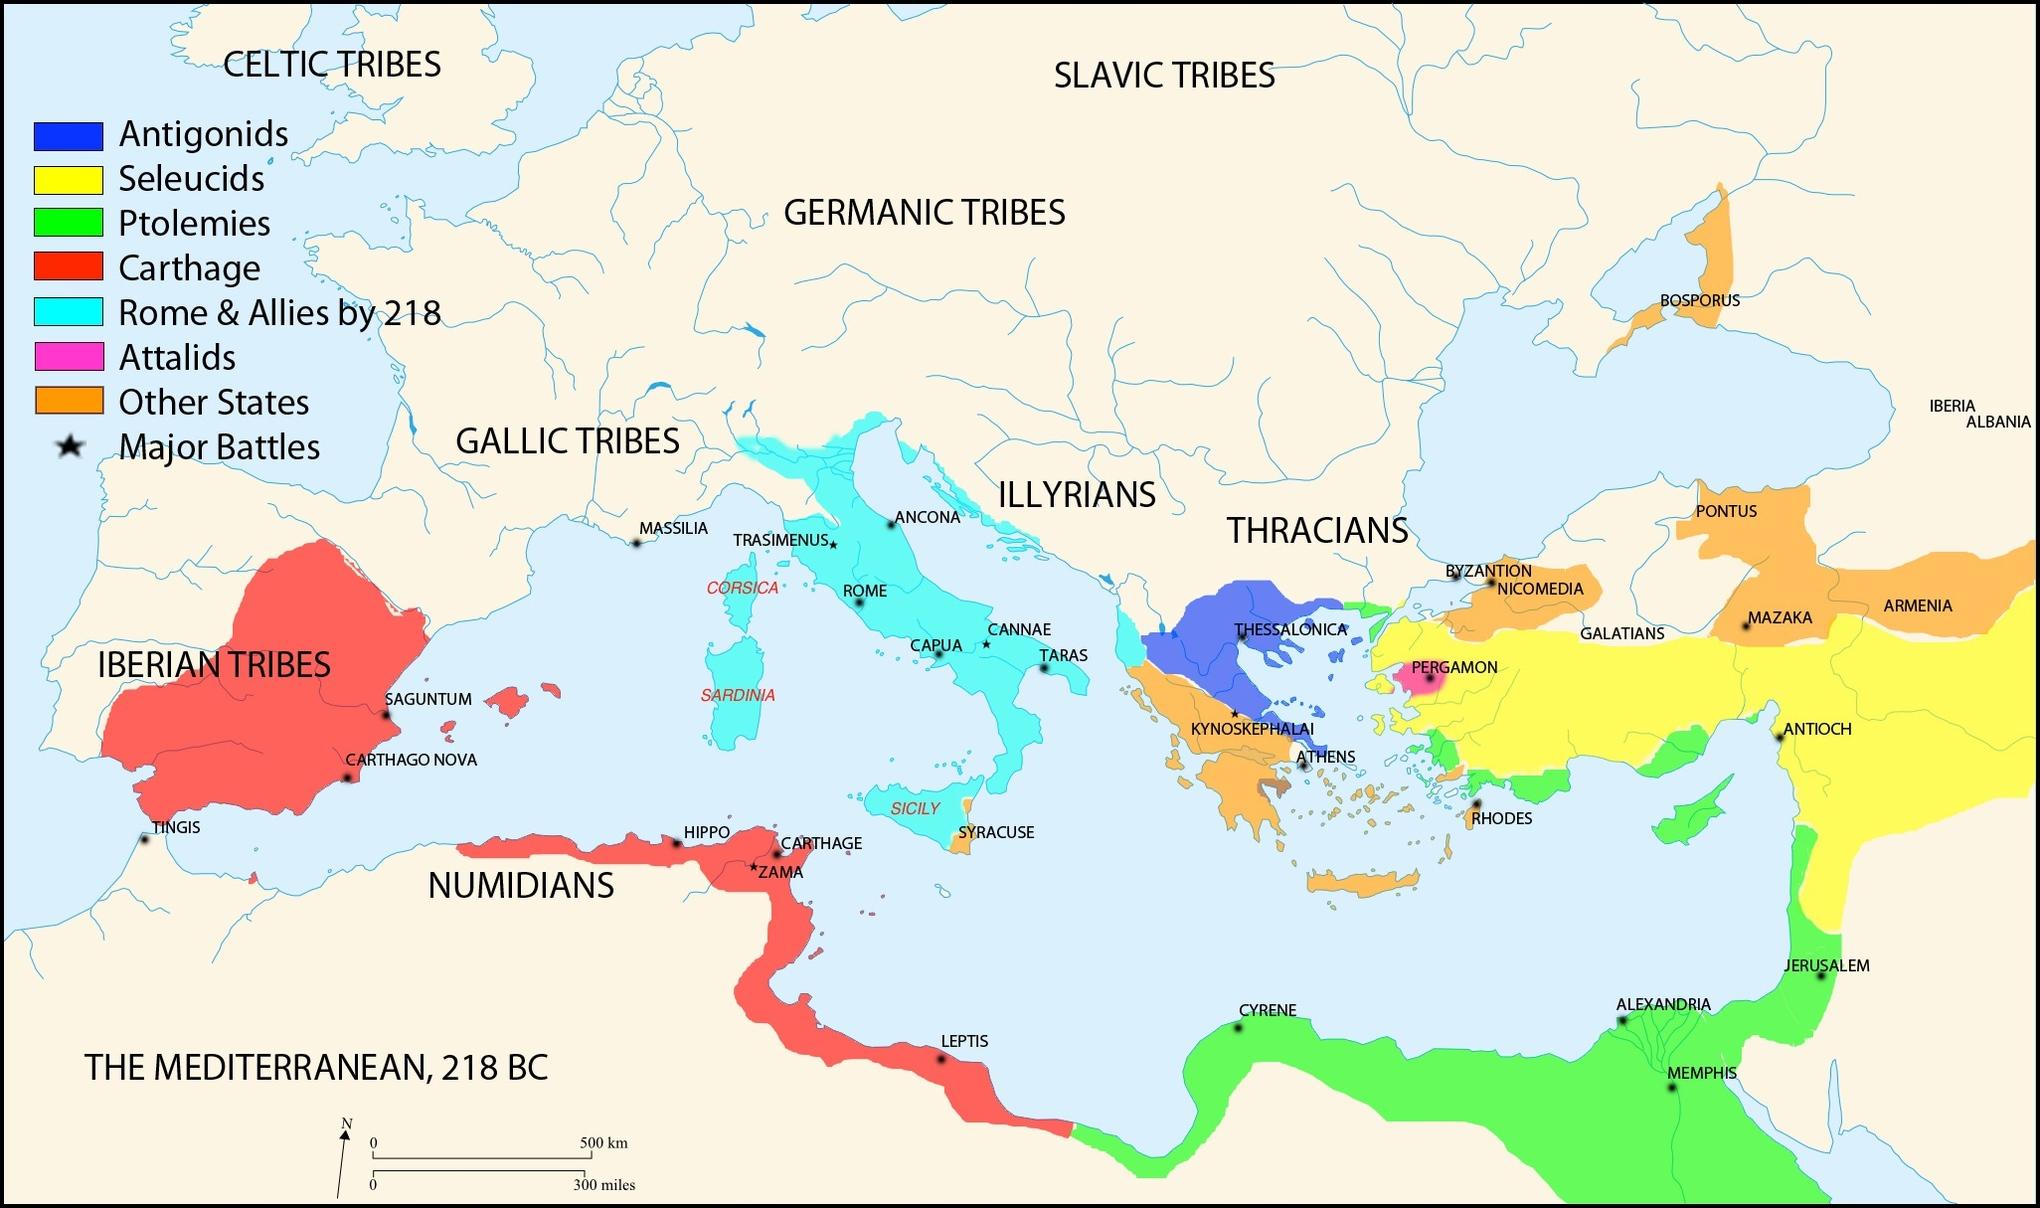 40 Maps That Explain The Roman Empire